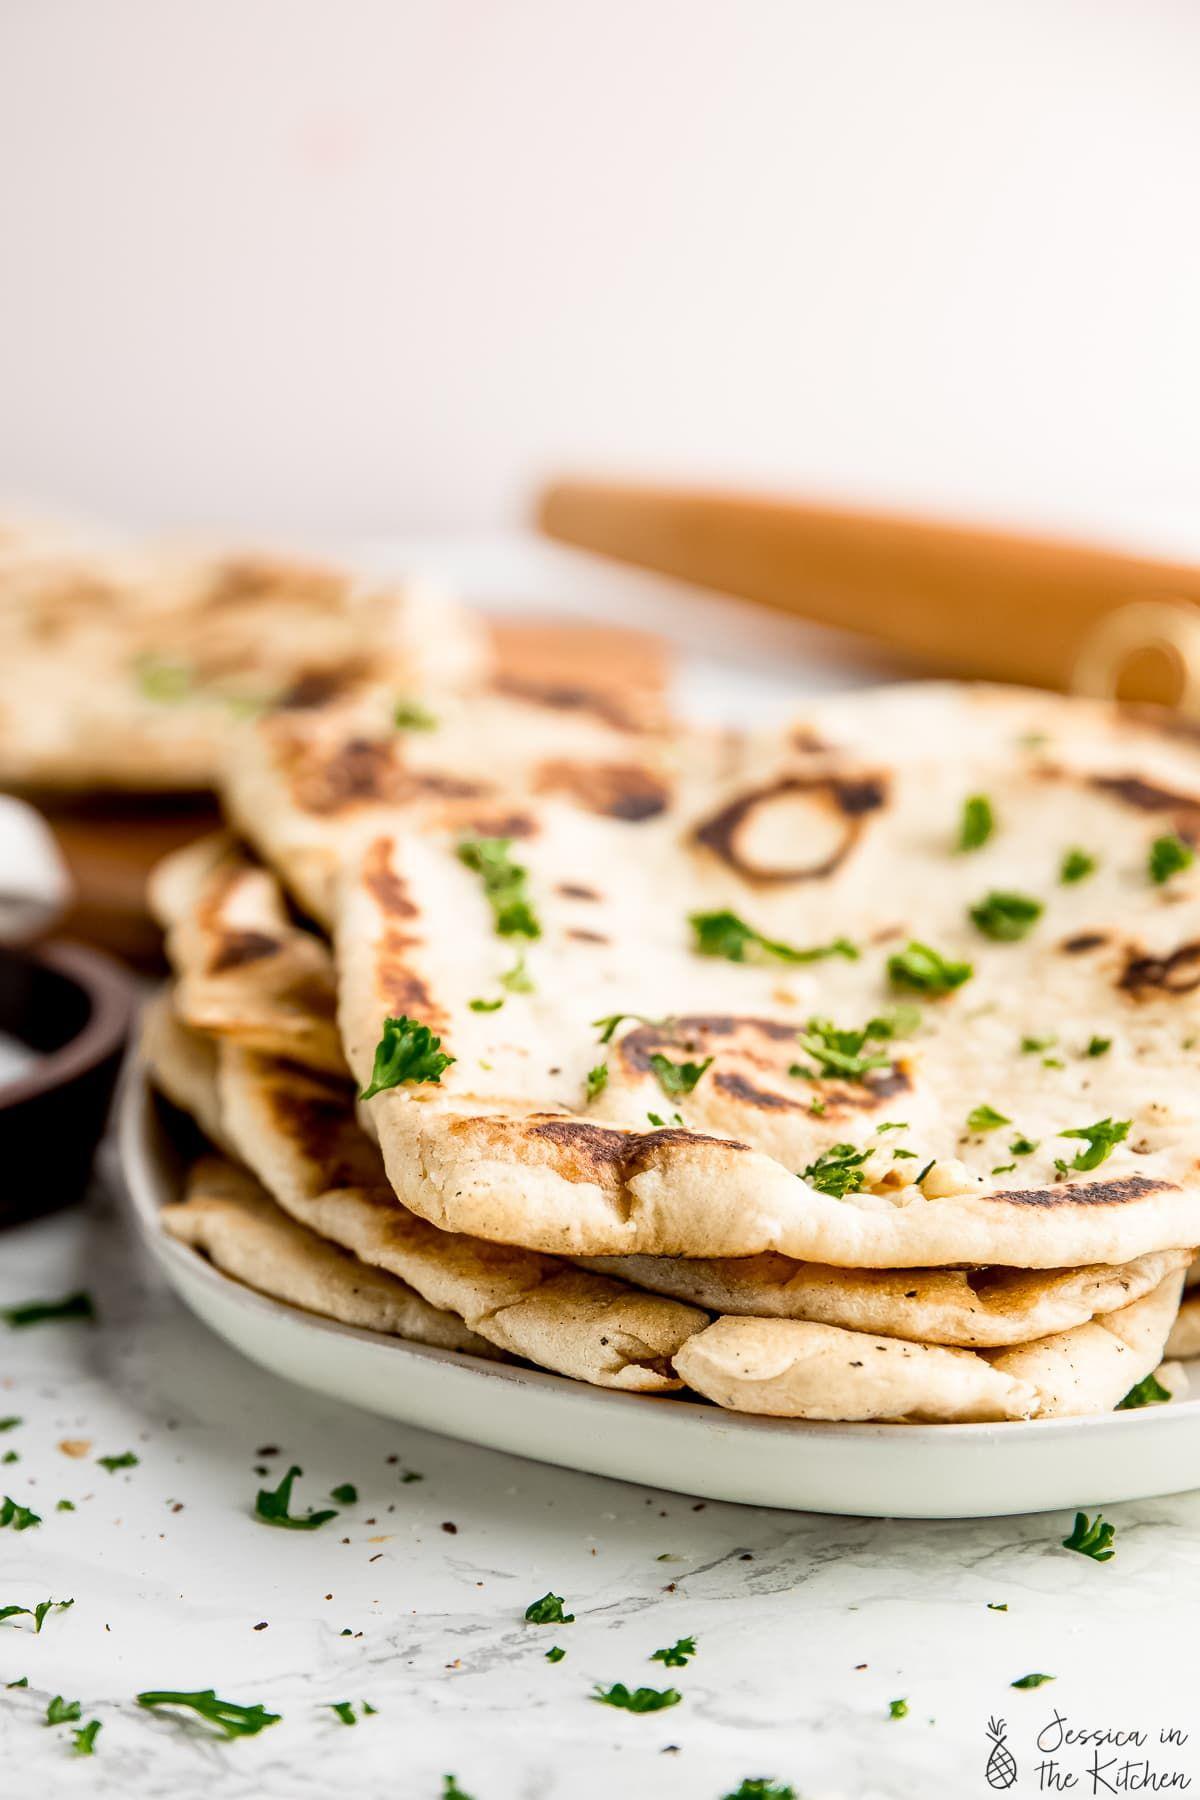 Vegan Naan Recipe Indian Flatbread Soft Fluffy Recipe In 2020 Naan Recipe Vegan Naan Naan Bread